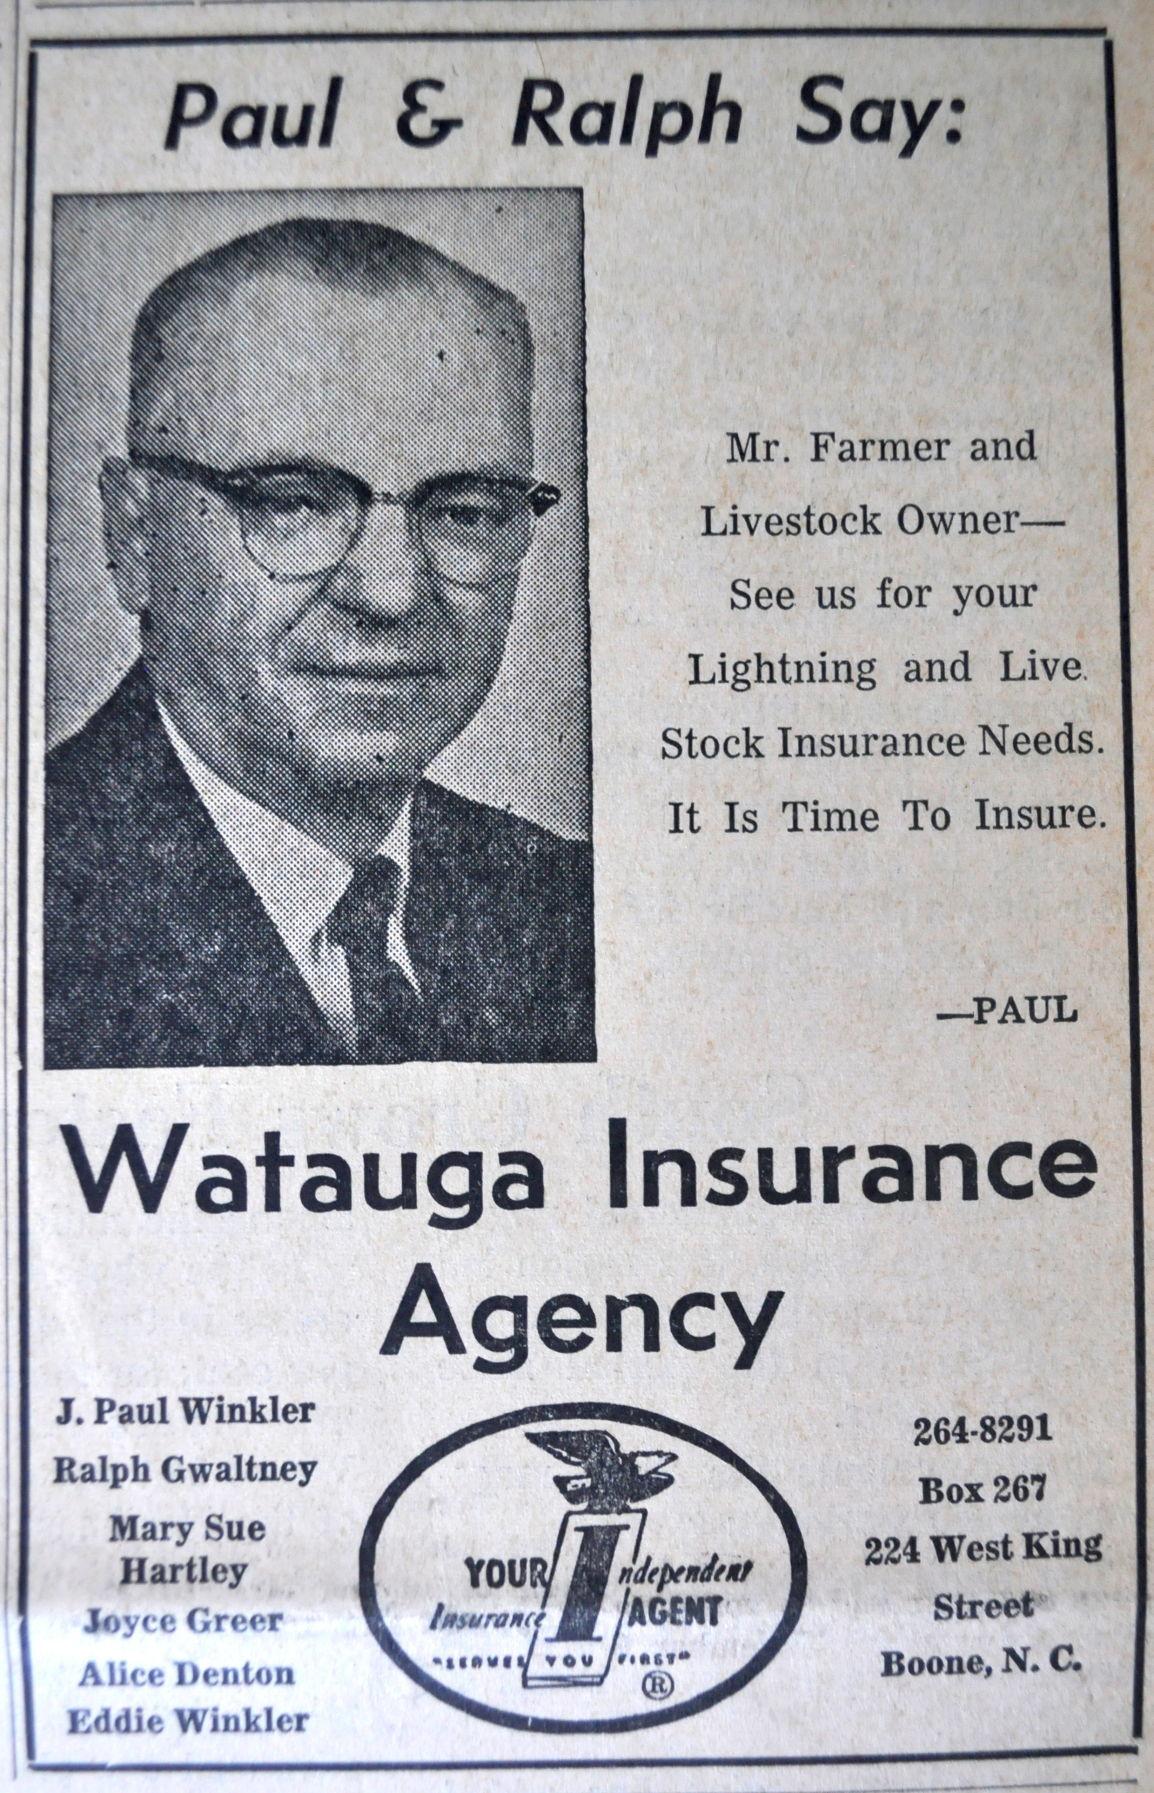 Watauga Insurance Agency